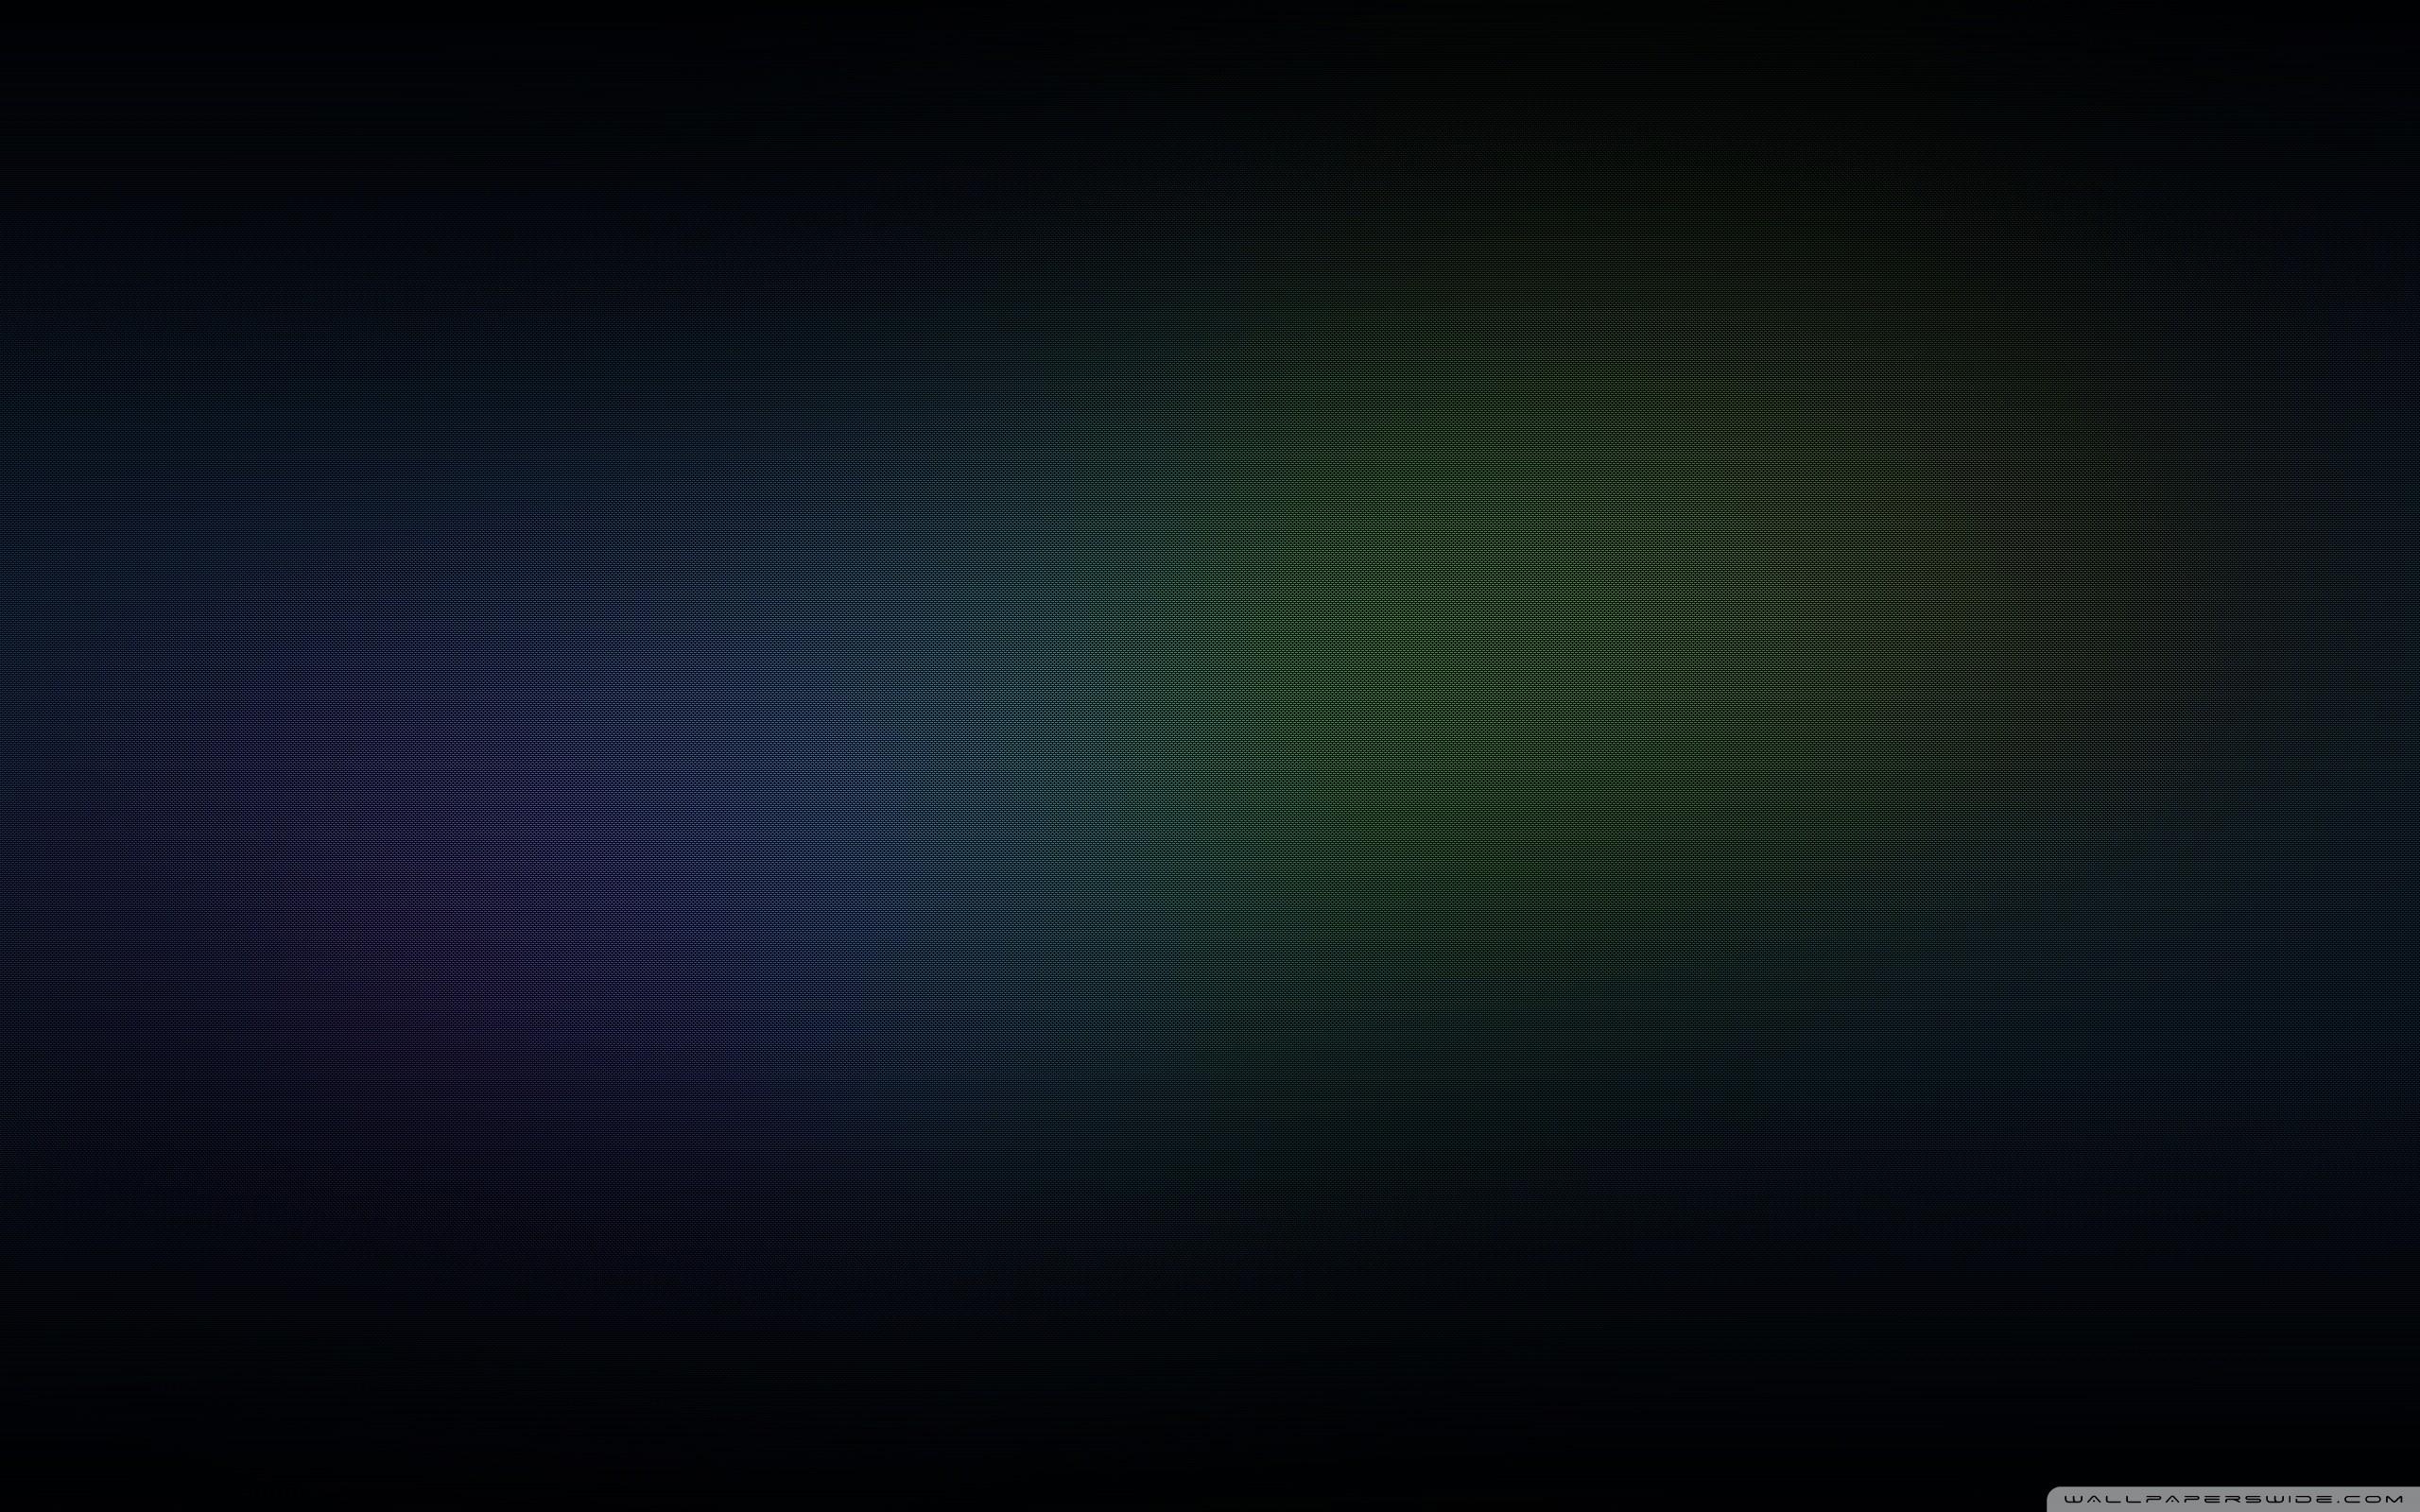 Dark color wallpapers